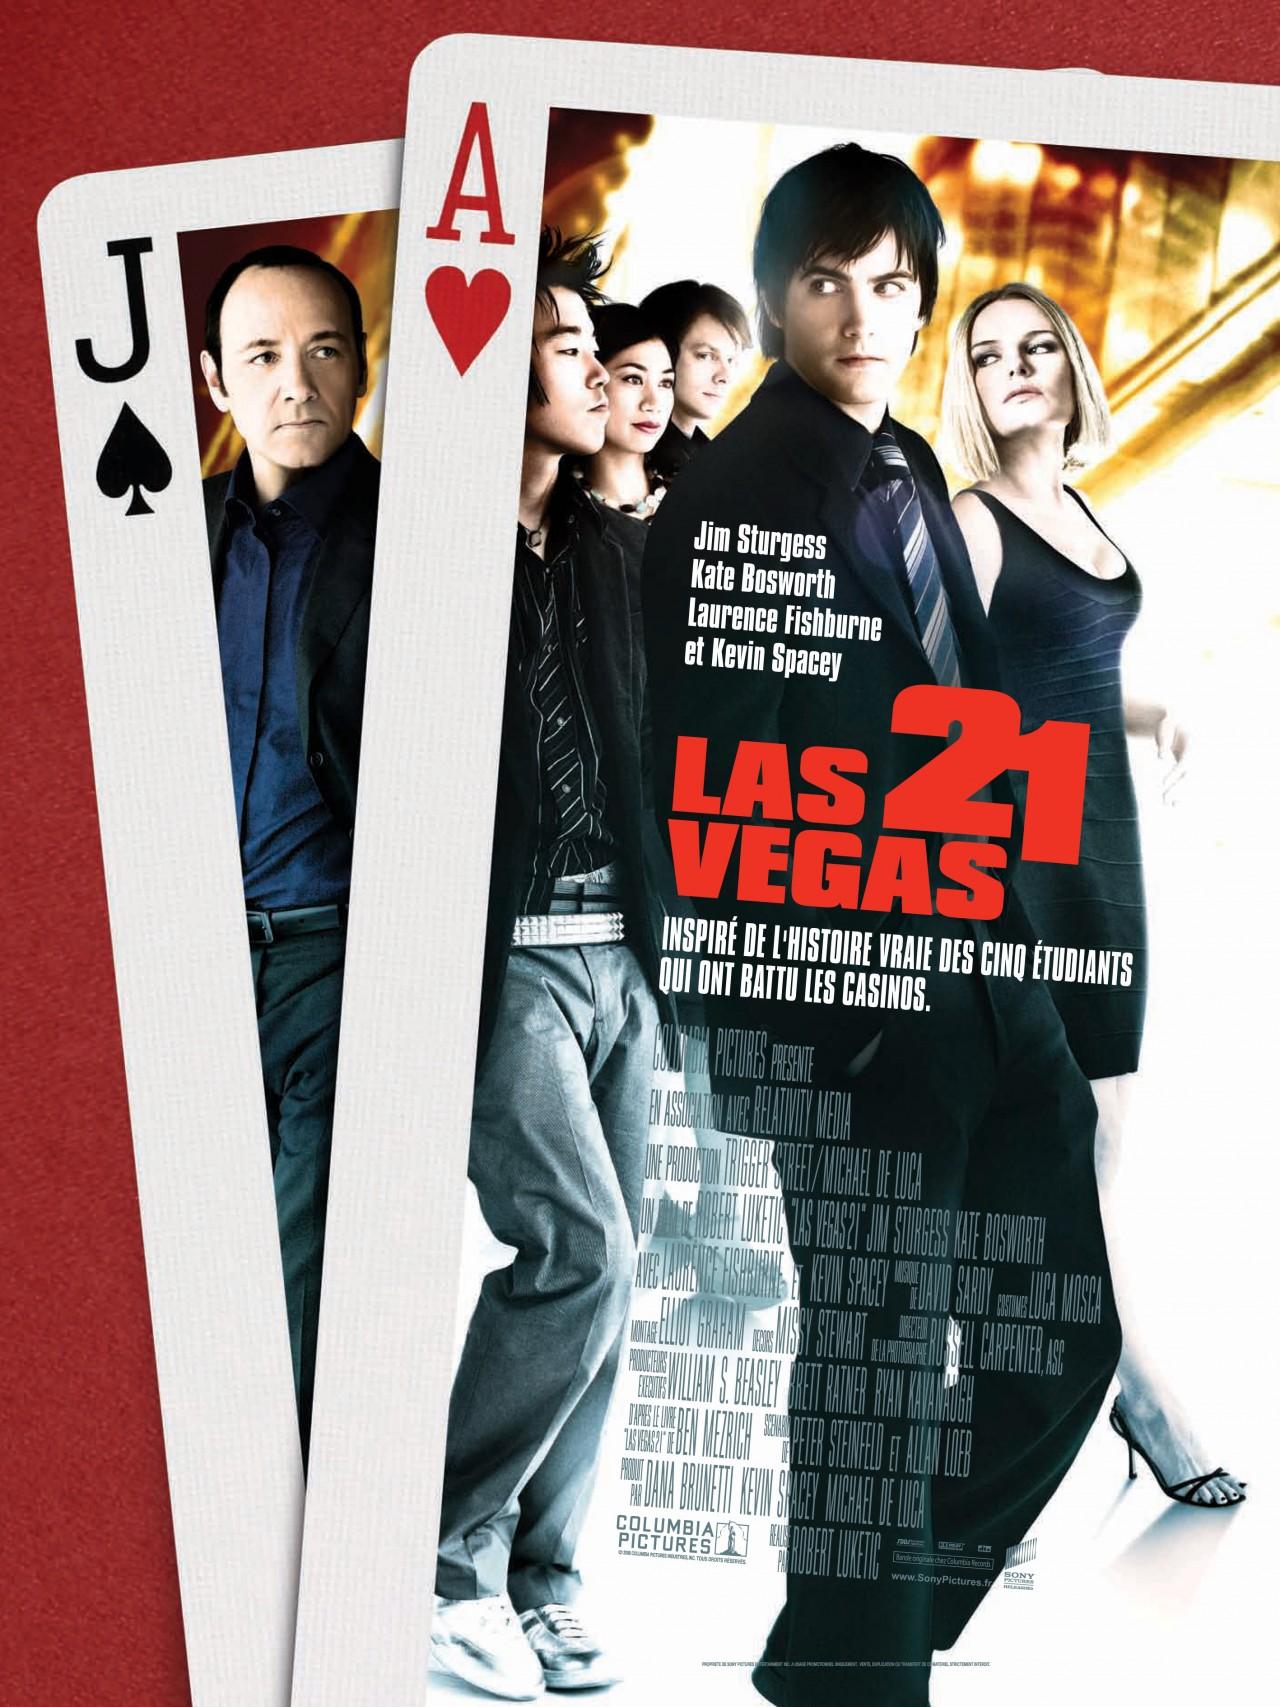 Las Vegas 21 [FRENCH|DVDRiP|AC3]